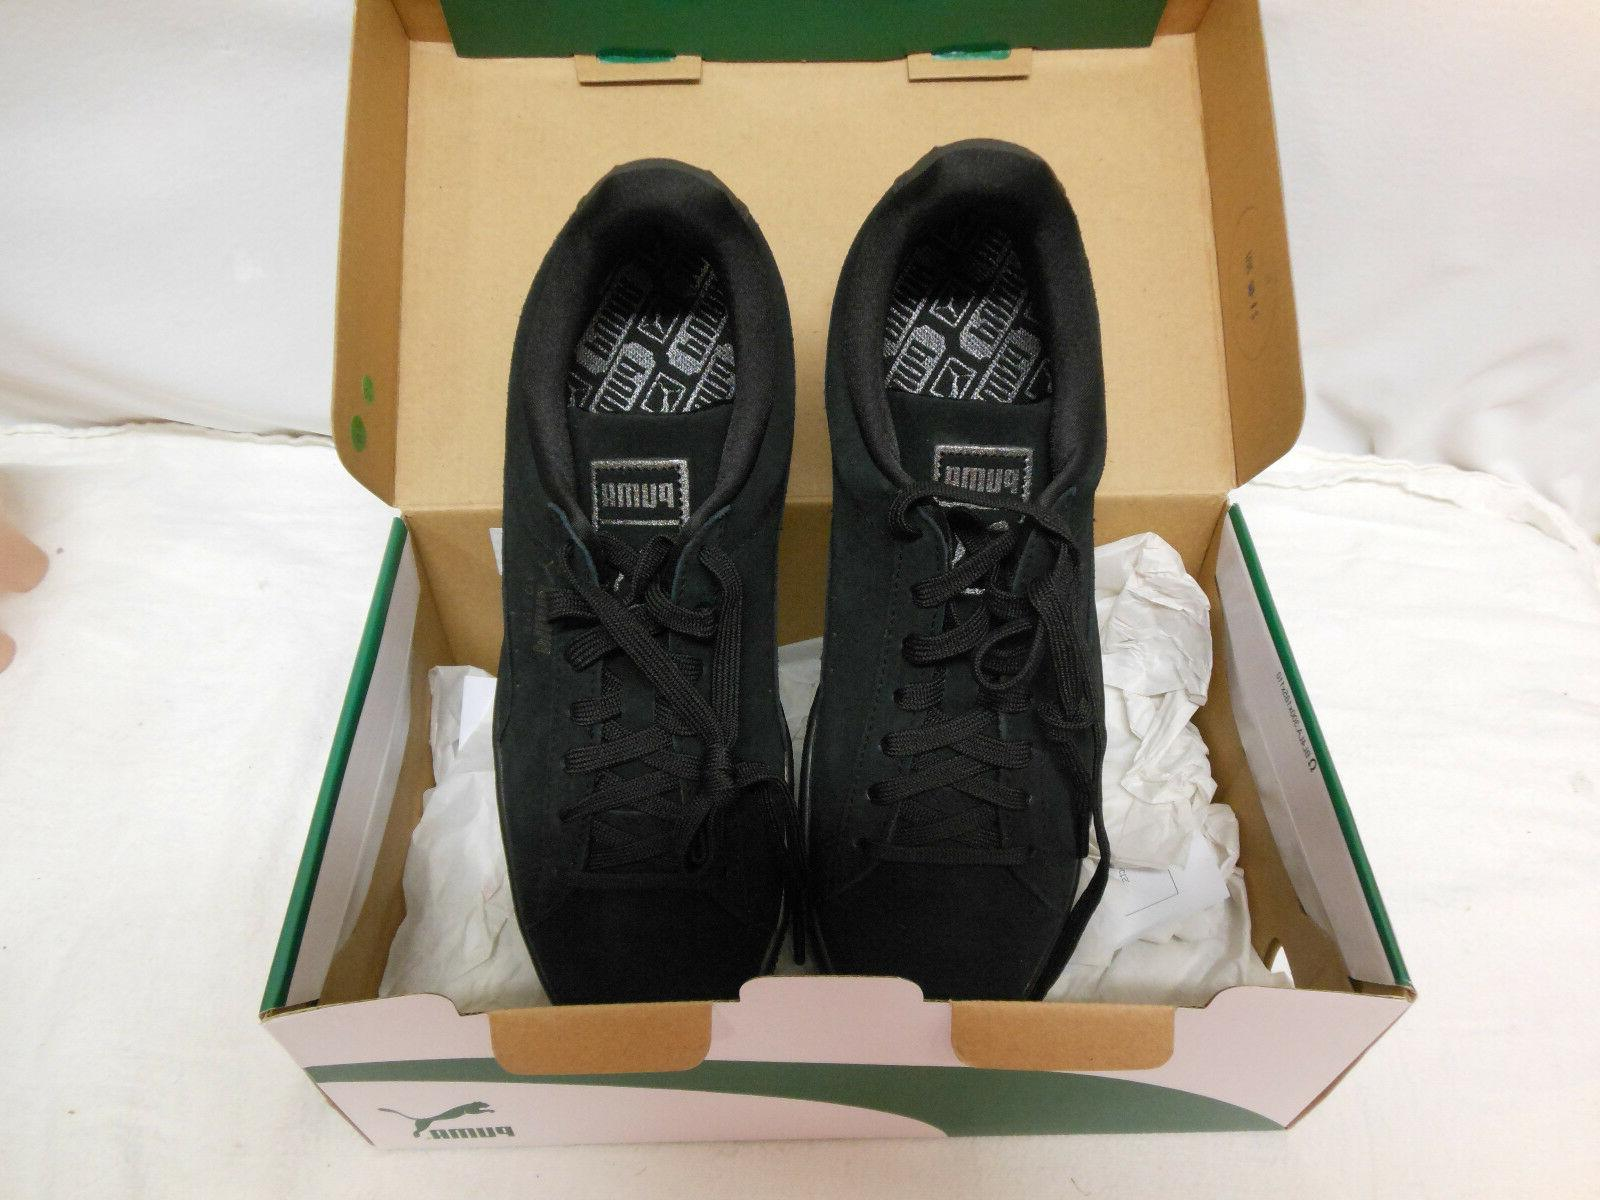 Suede Classic Men's Shoes Item 363872 03PUMA